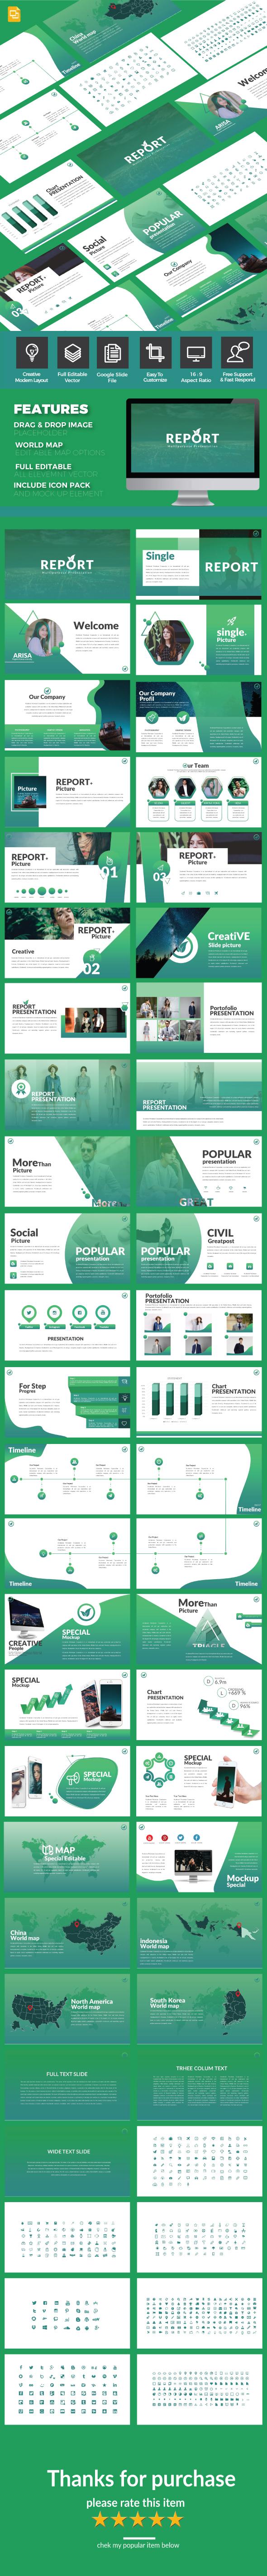 Report - Google Slide Multipurpose Template - Google Slides Presentation Templates